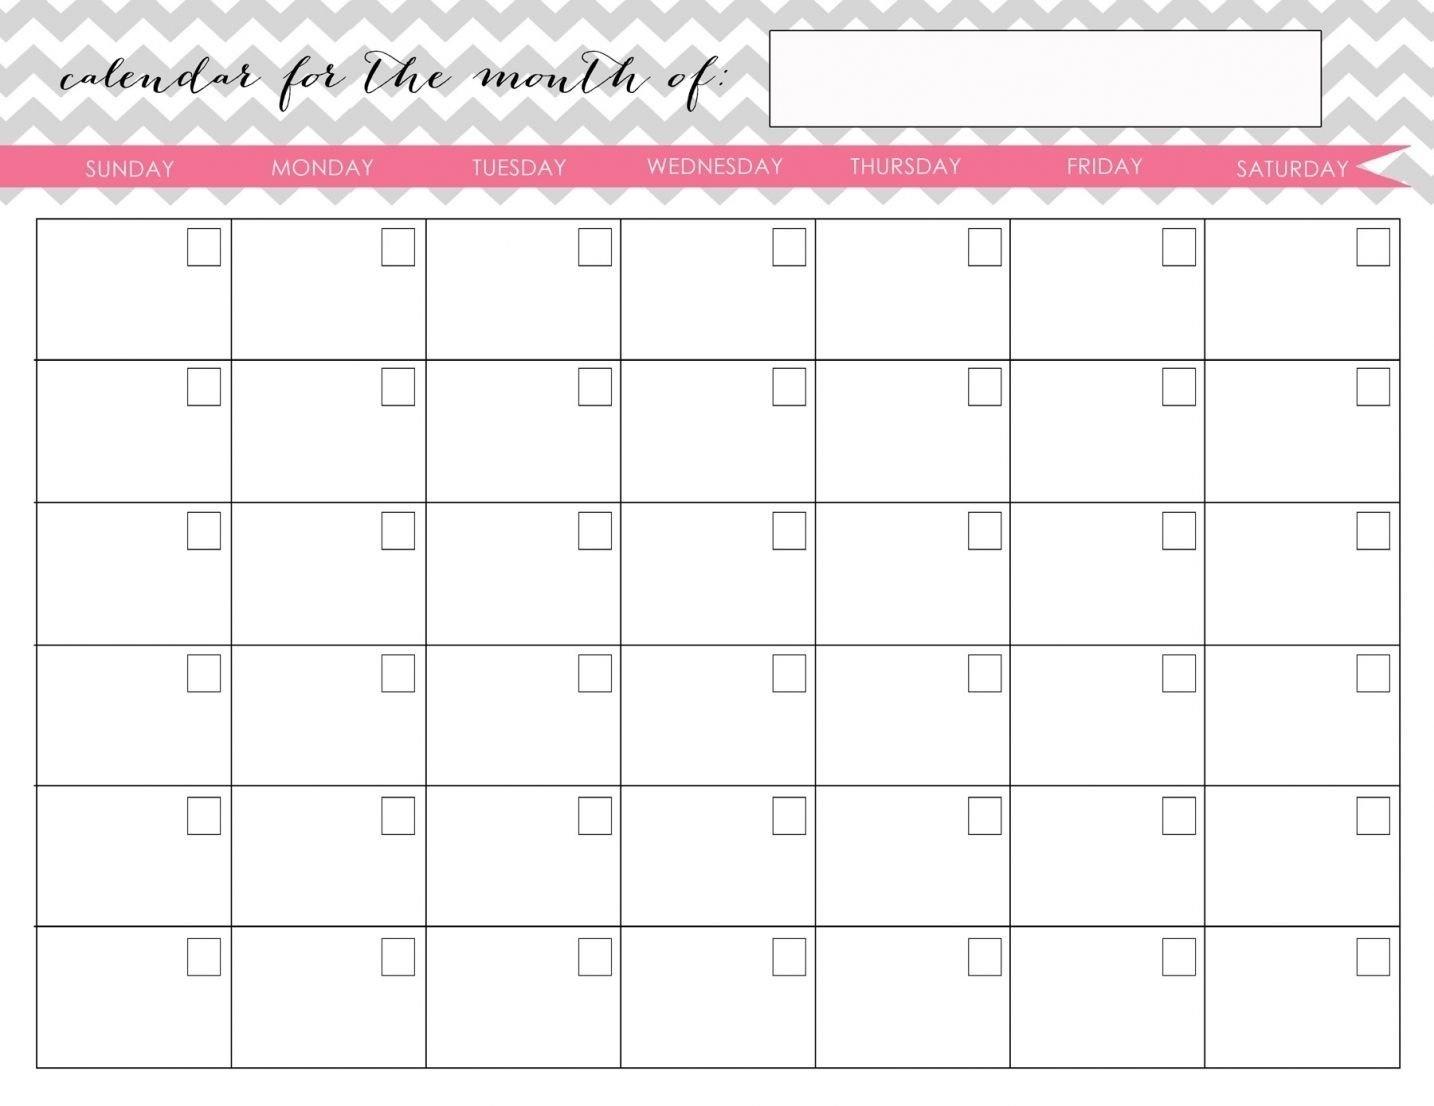 Printable Fill In Calendarmonth | Calendar Template Fill In And Print Calendar